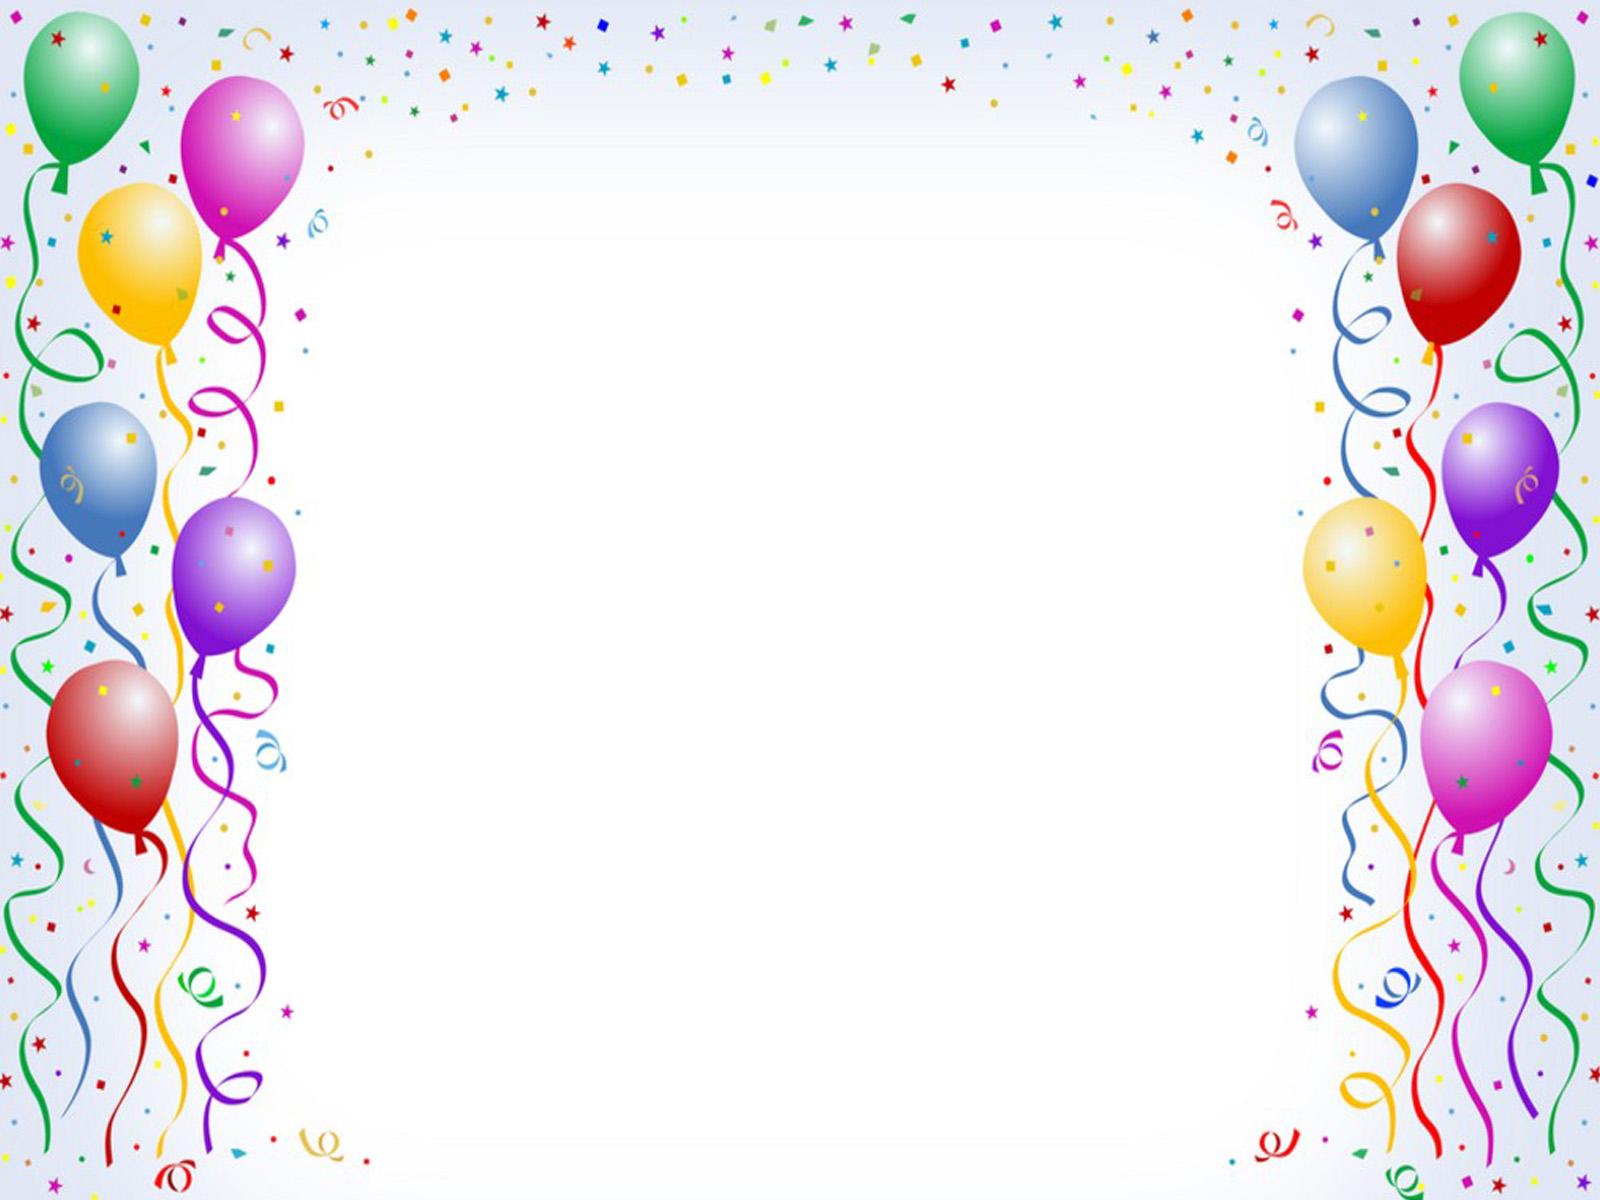 Birthday Background wallpaper 1600x1200 26403 1600x1200